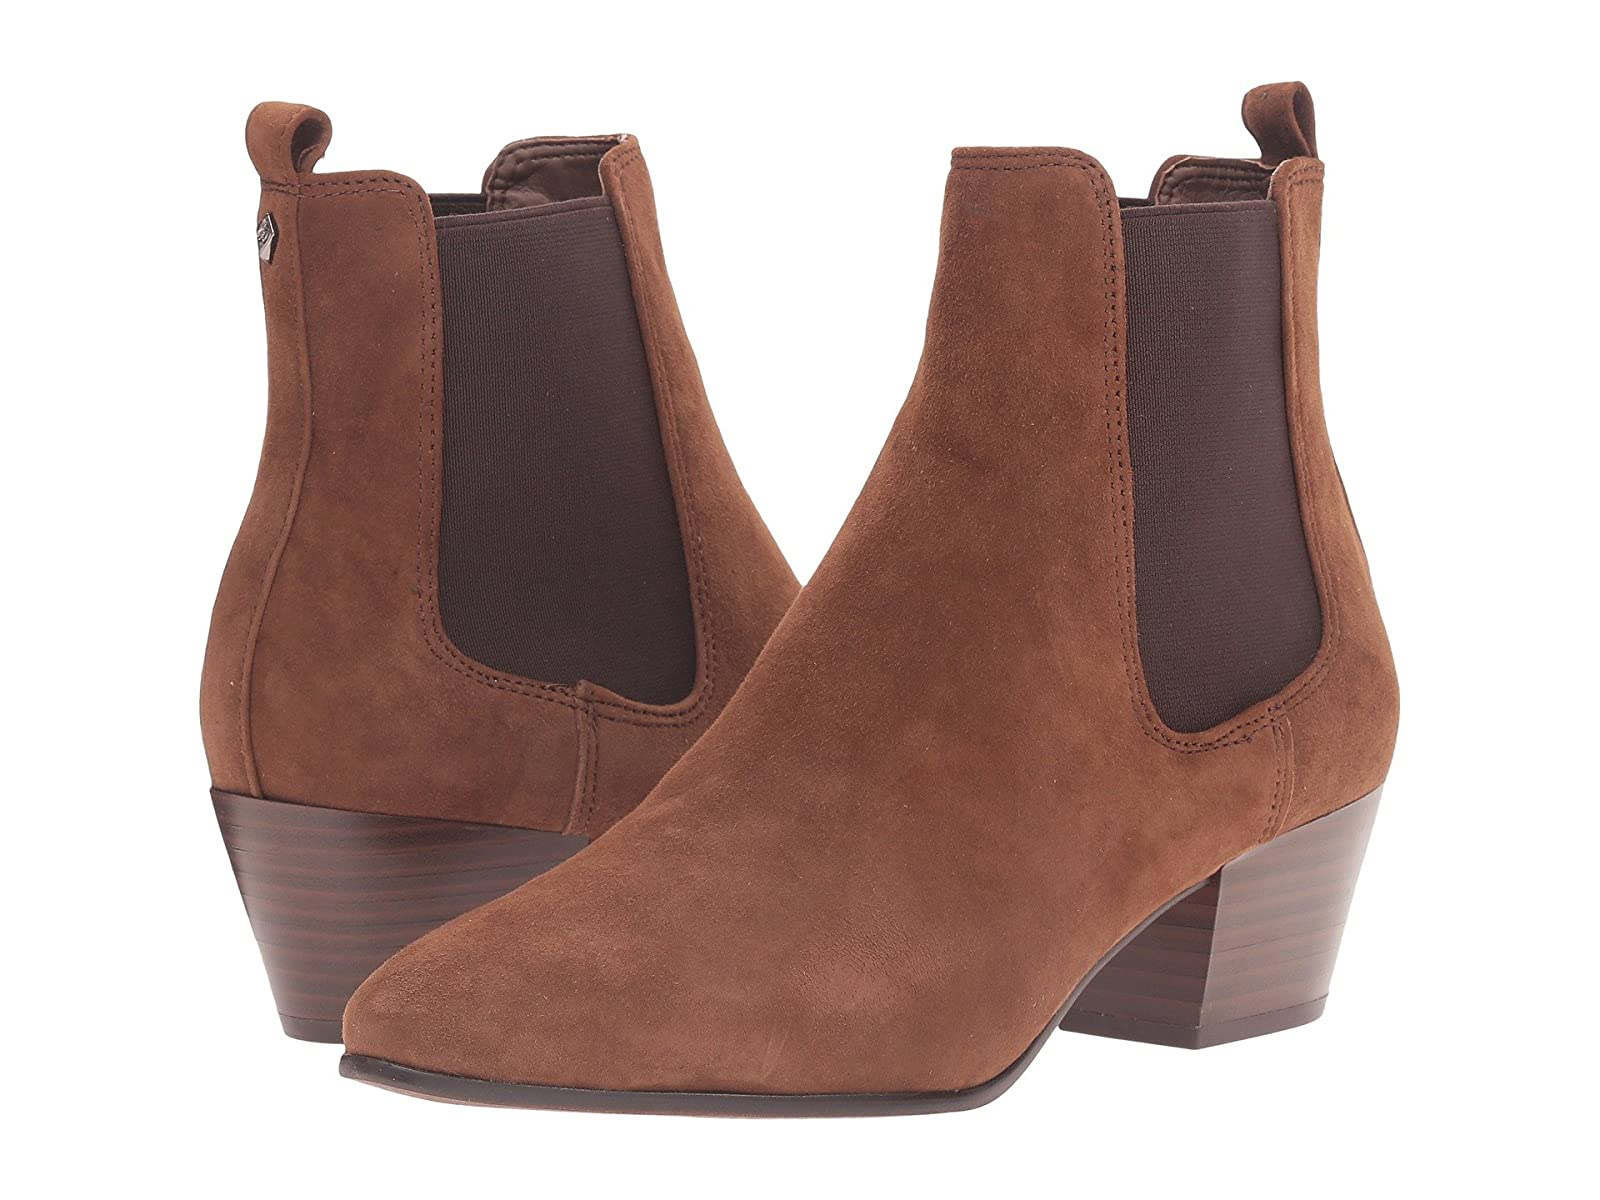 Sam Edelman ReesaCheap and distinctive eye-catching shoes